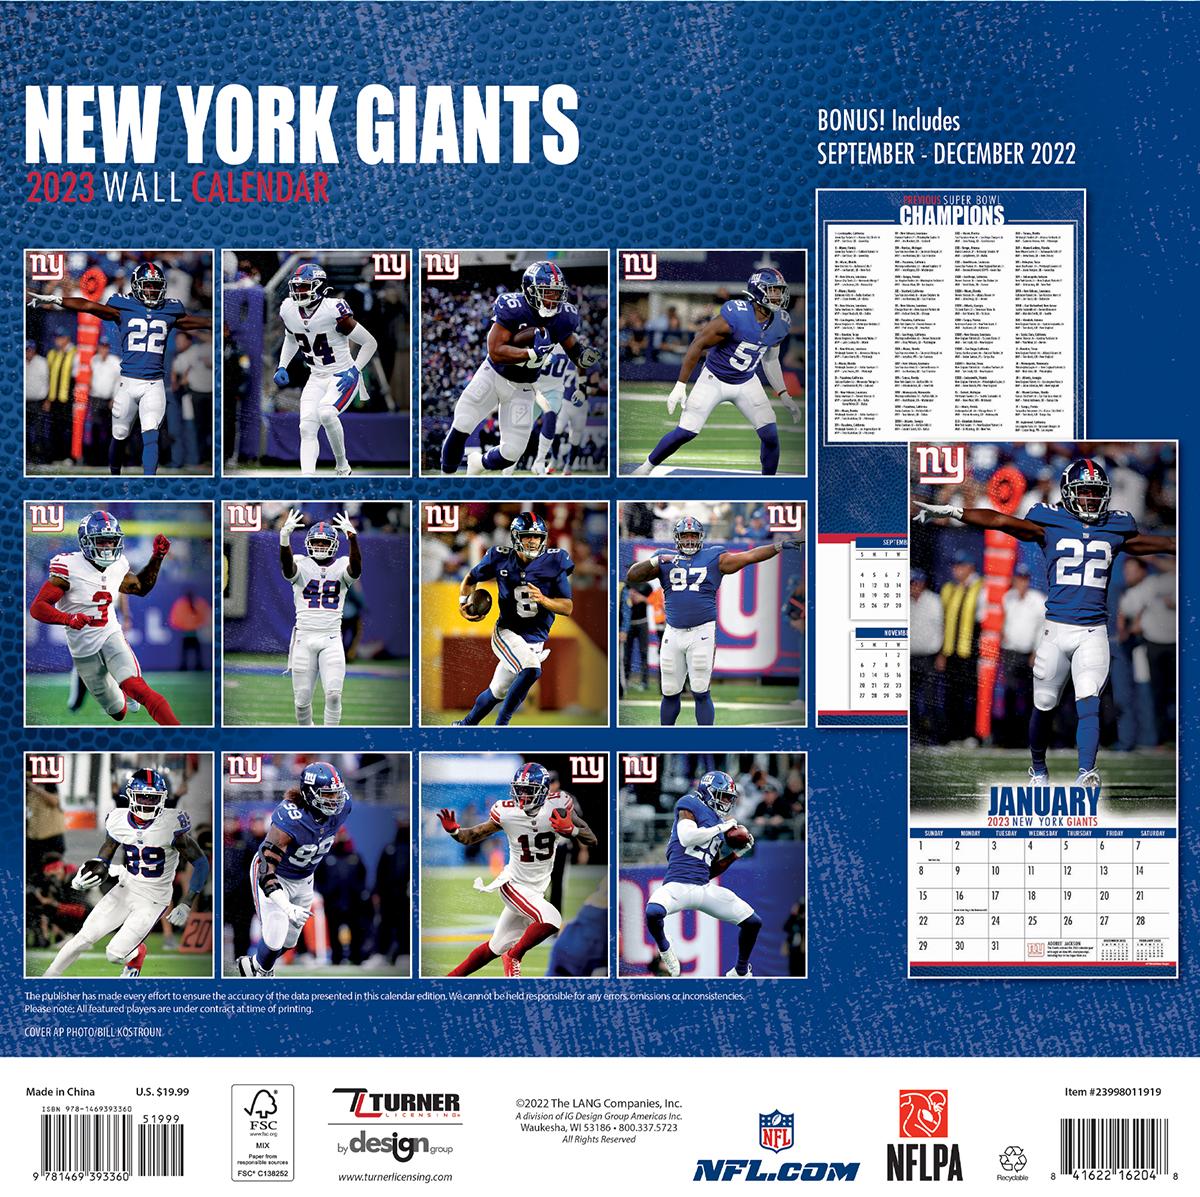 New York Giants 2019 Nfl Mini Wall Calendar Buy At Khc